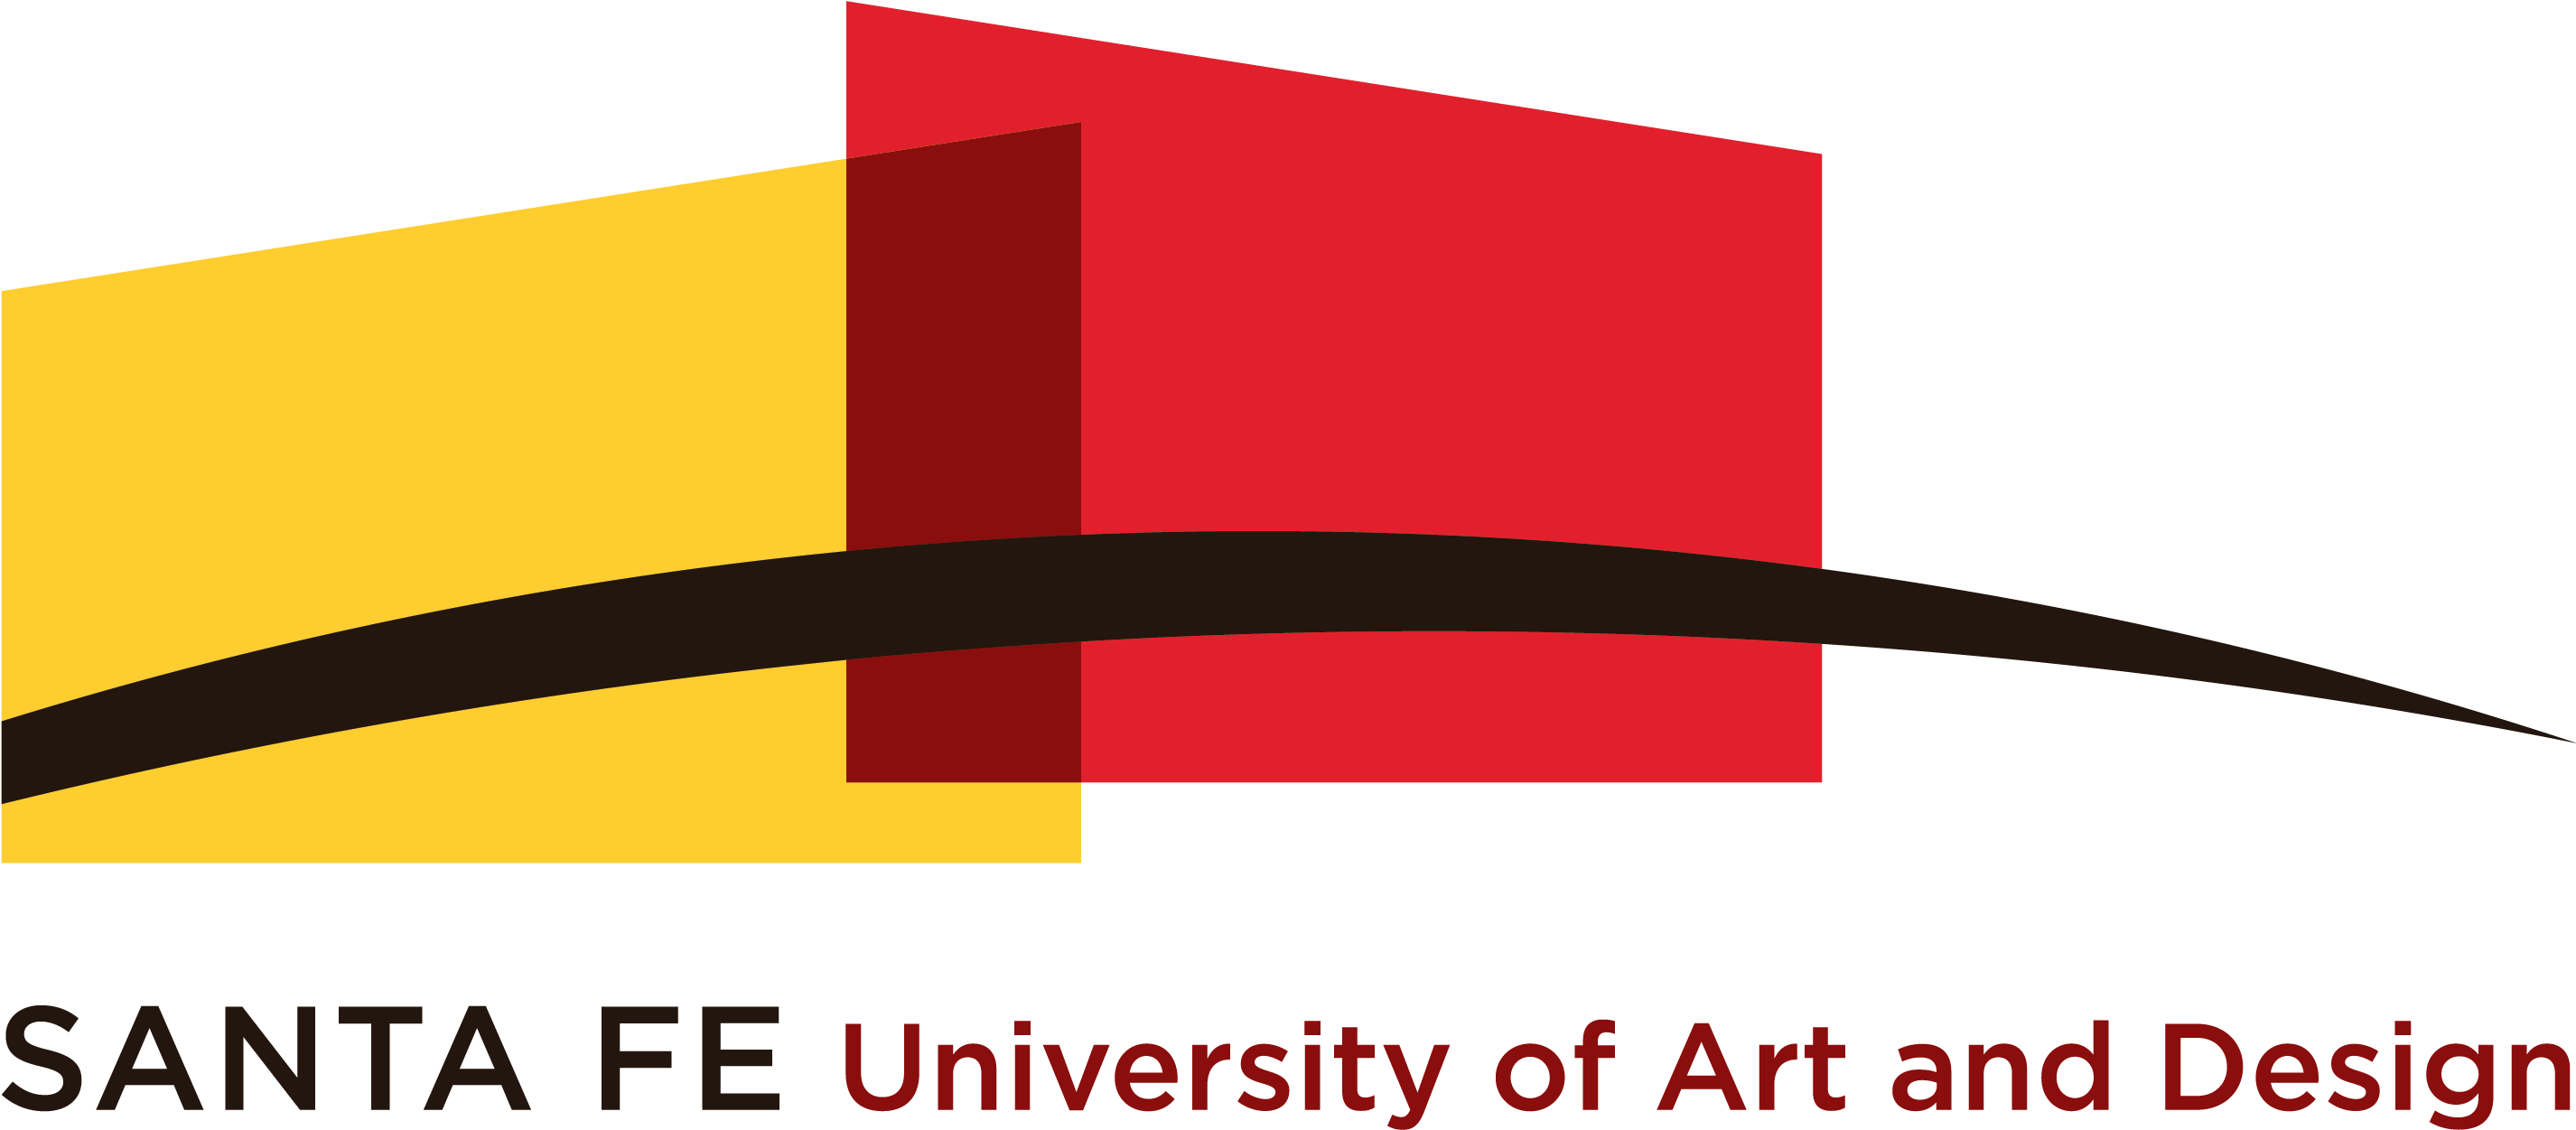 Marcos Hiller Formação de Estrategistas de Marca Logotipo Santa Fe University of Art and Design